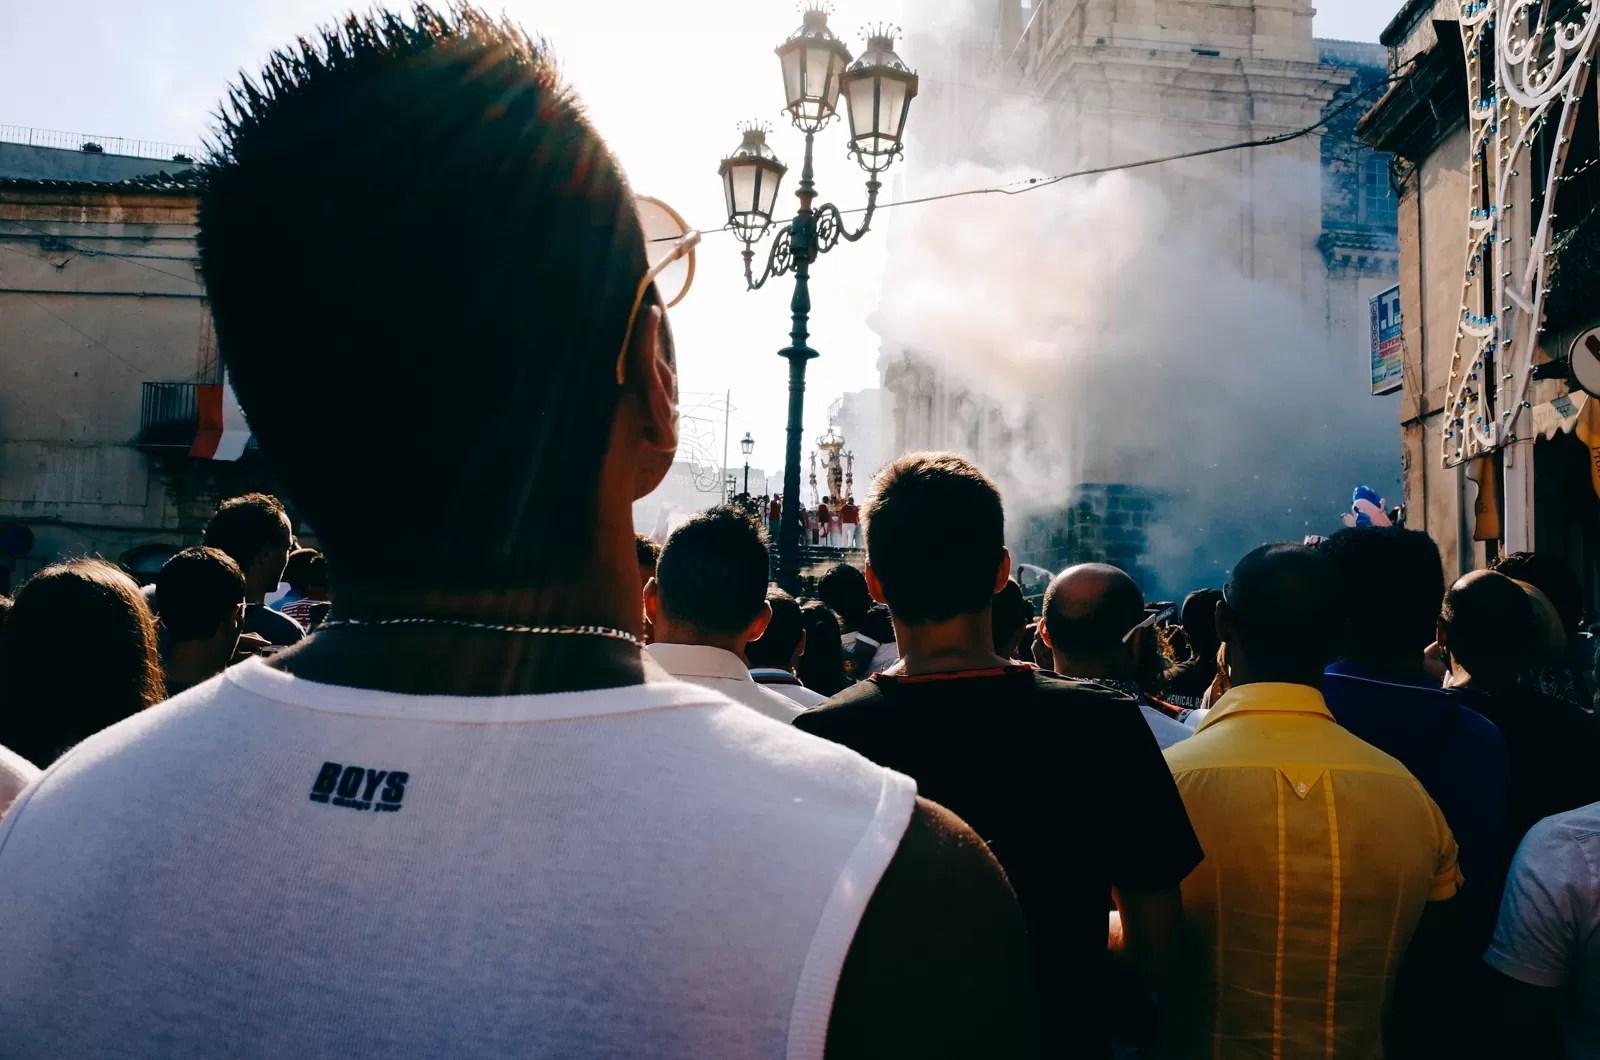 R0004745 - Siciliani in festa 18 Agosto 2015  (Parte 1) Street Photography Session - fotostreet.it